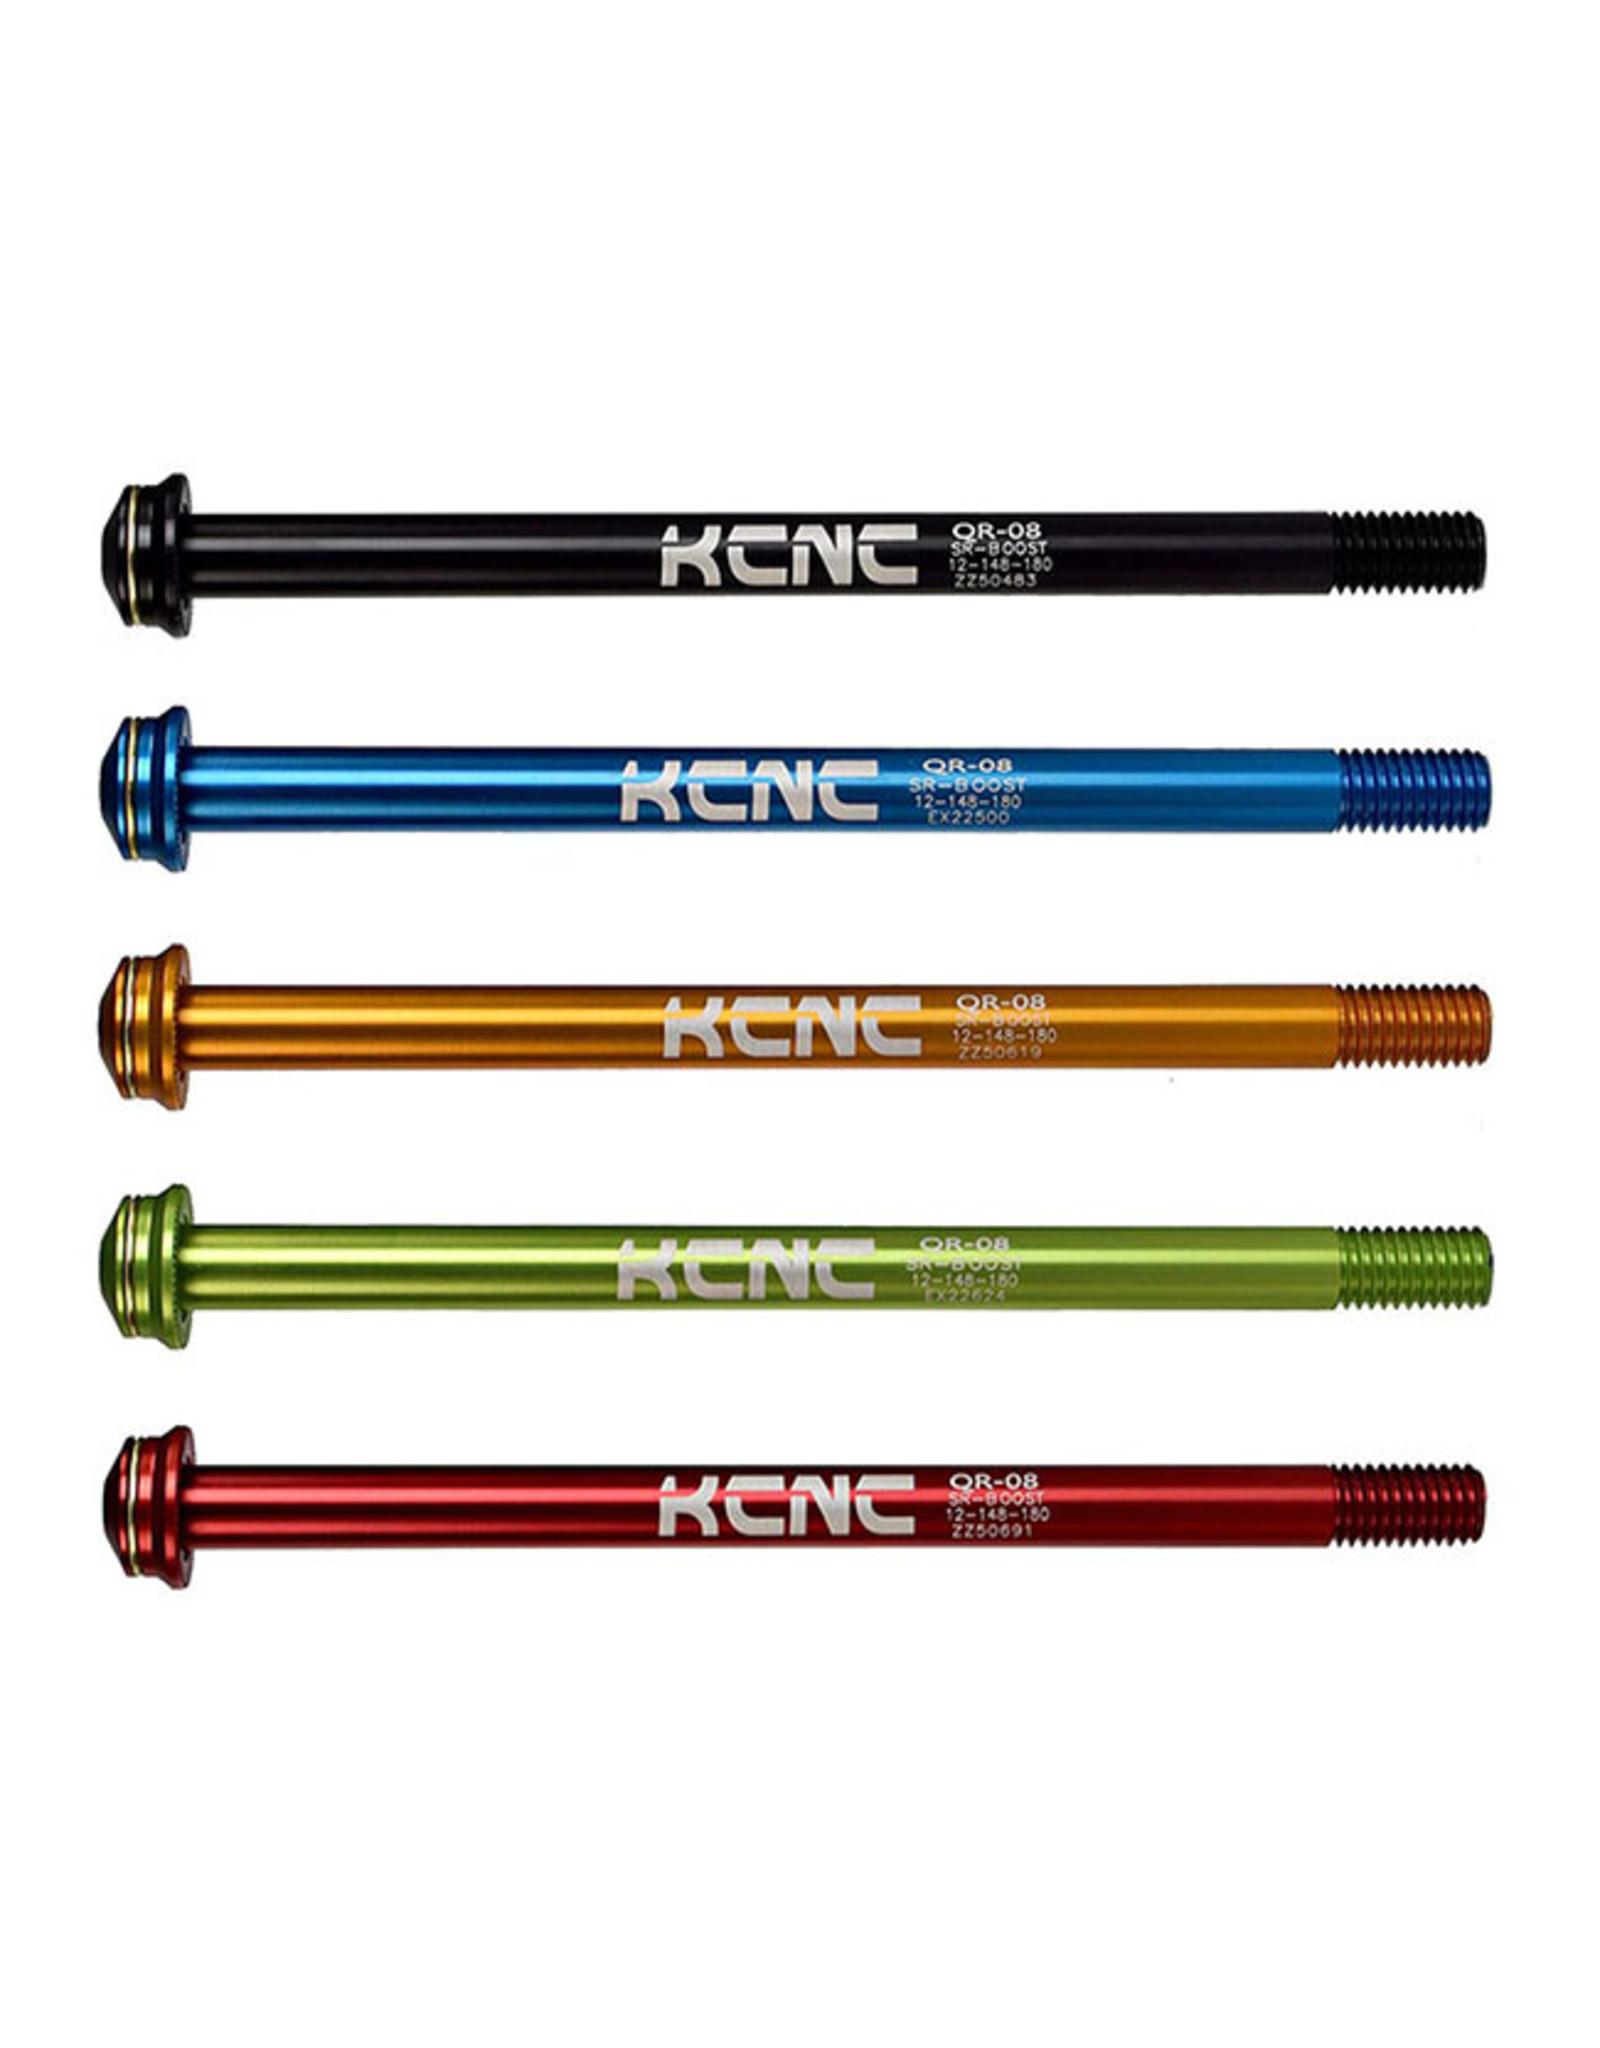 KCNC KCNC 6061 Rear Thru Axle